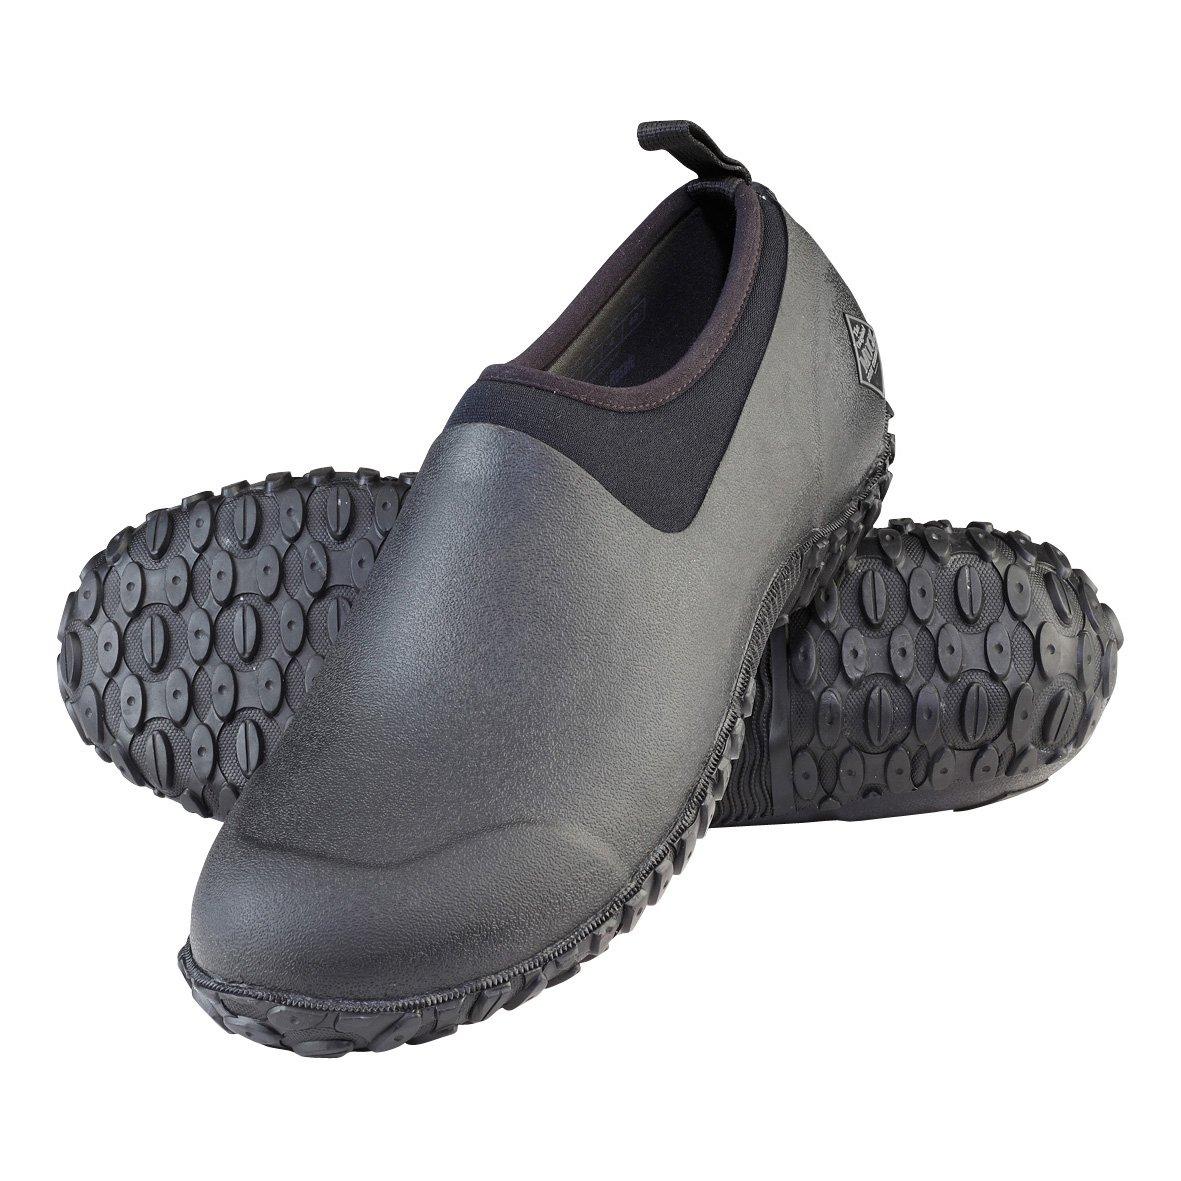 Muckster ll Men's Rubber Garden Shoes,black,9 US/9-9.5 M US